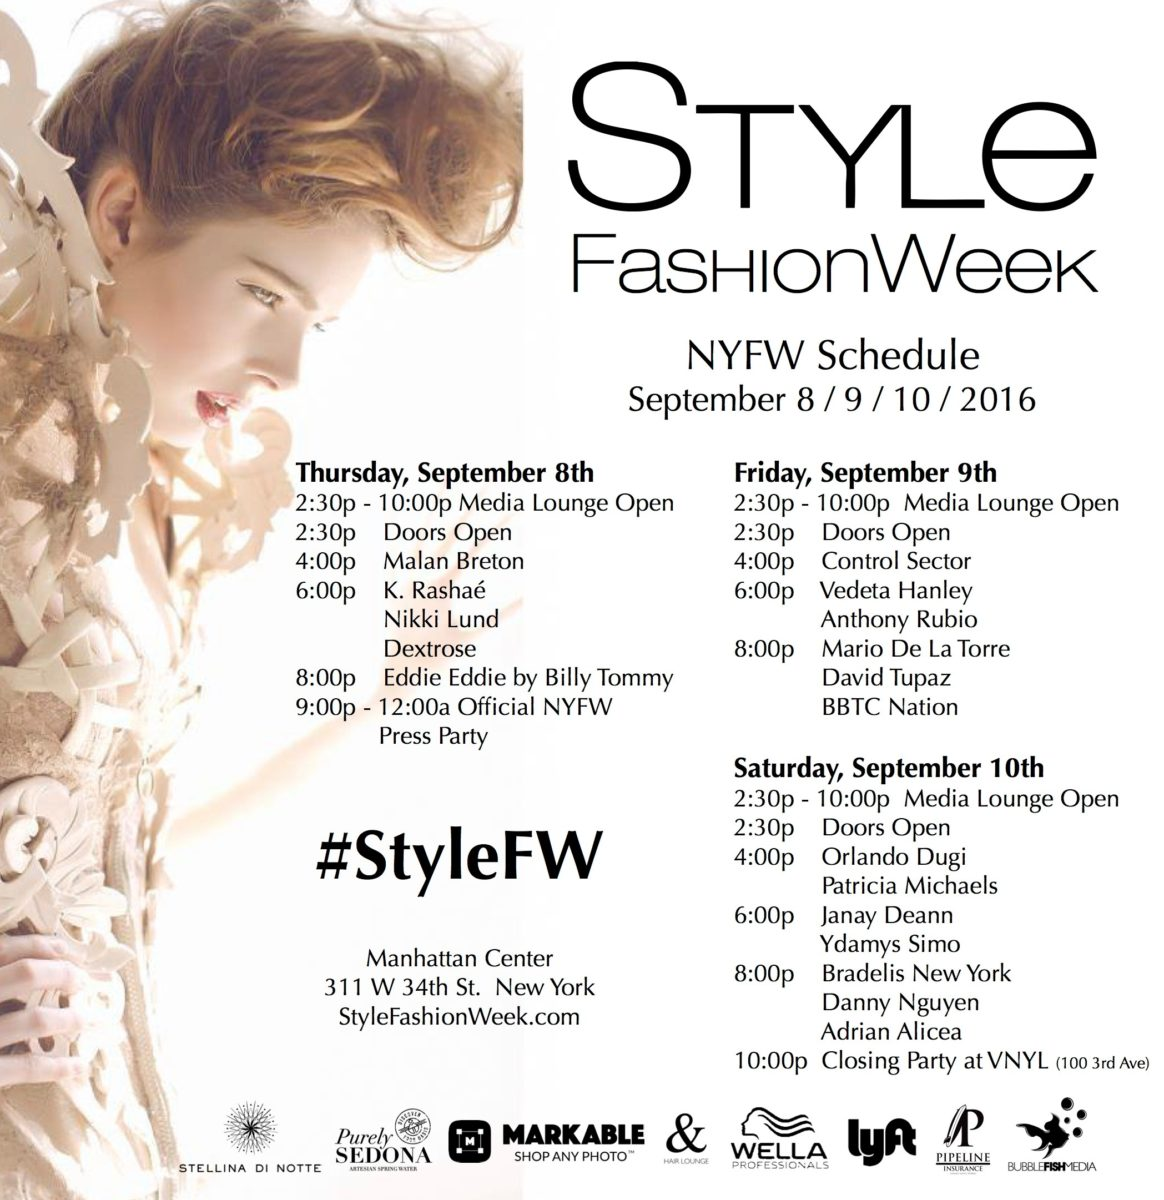 Style Fashion Week - NYFW Schedule